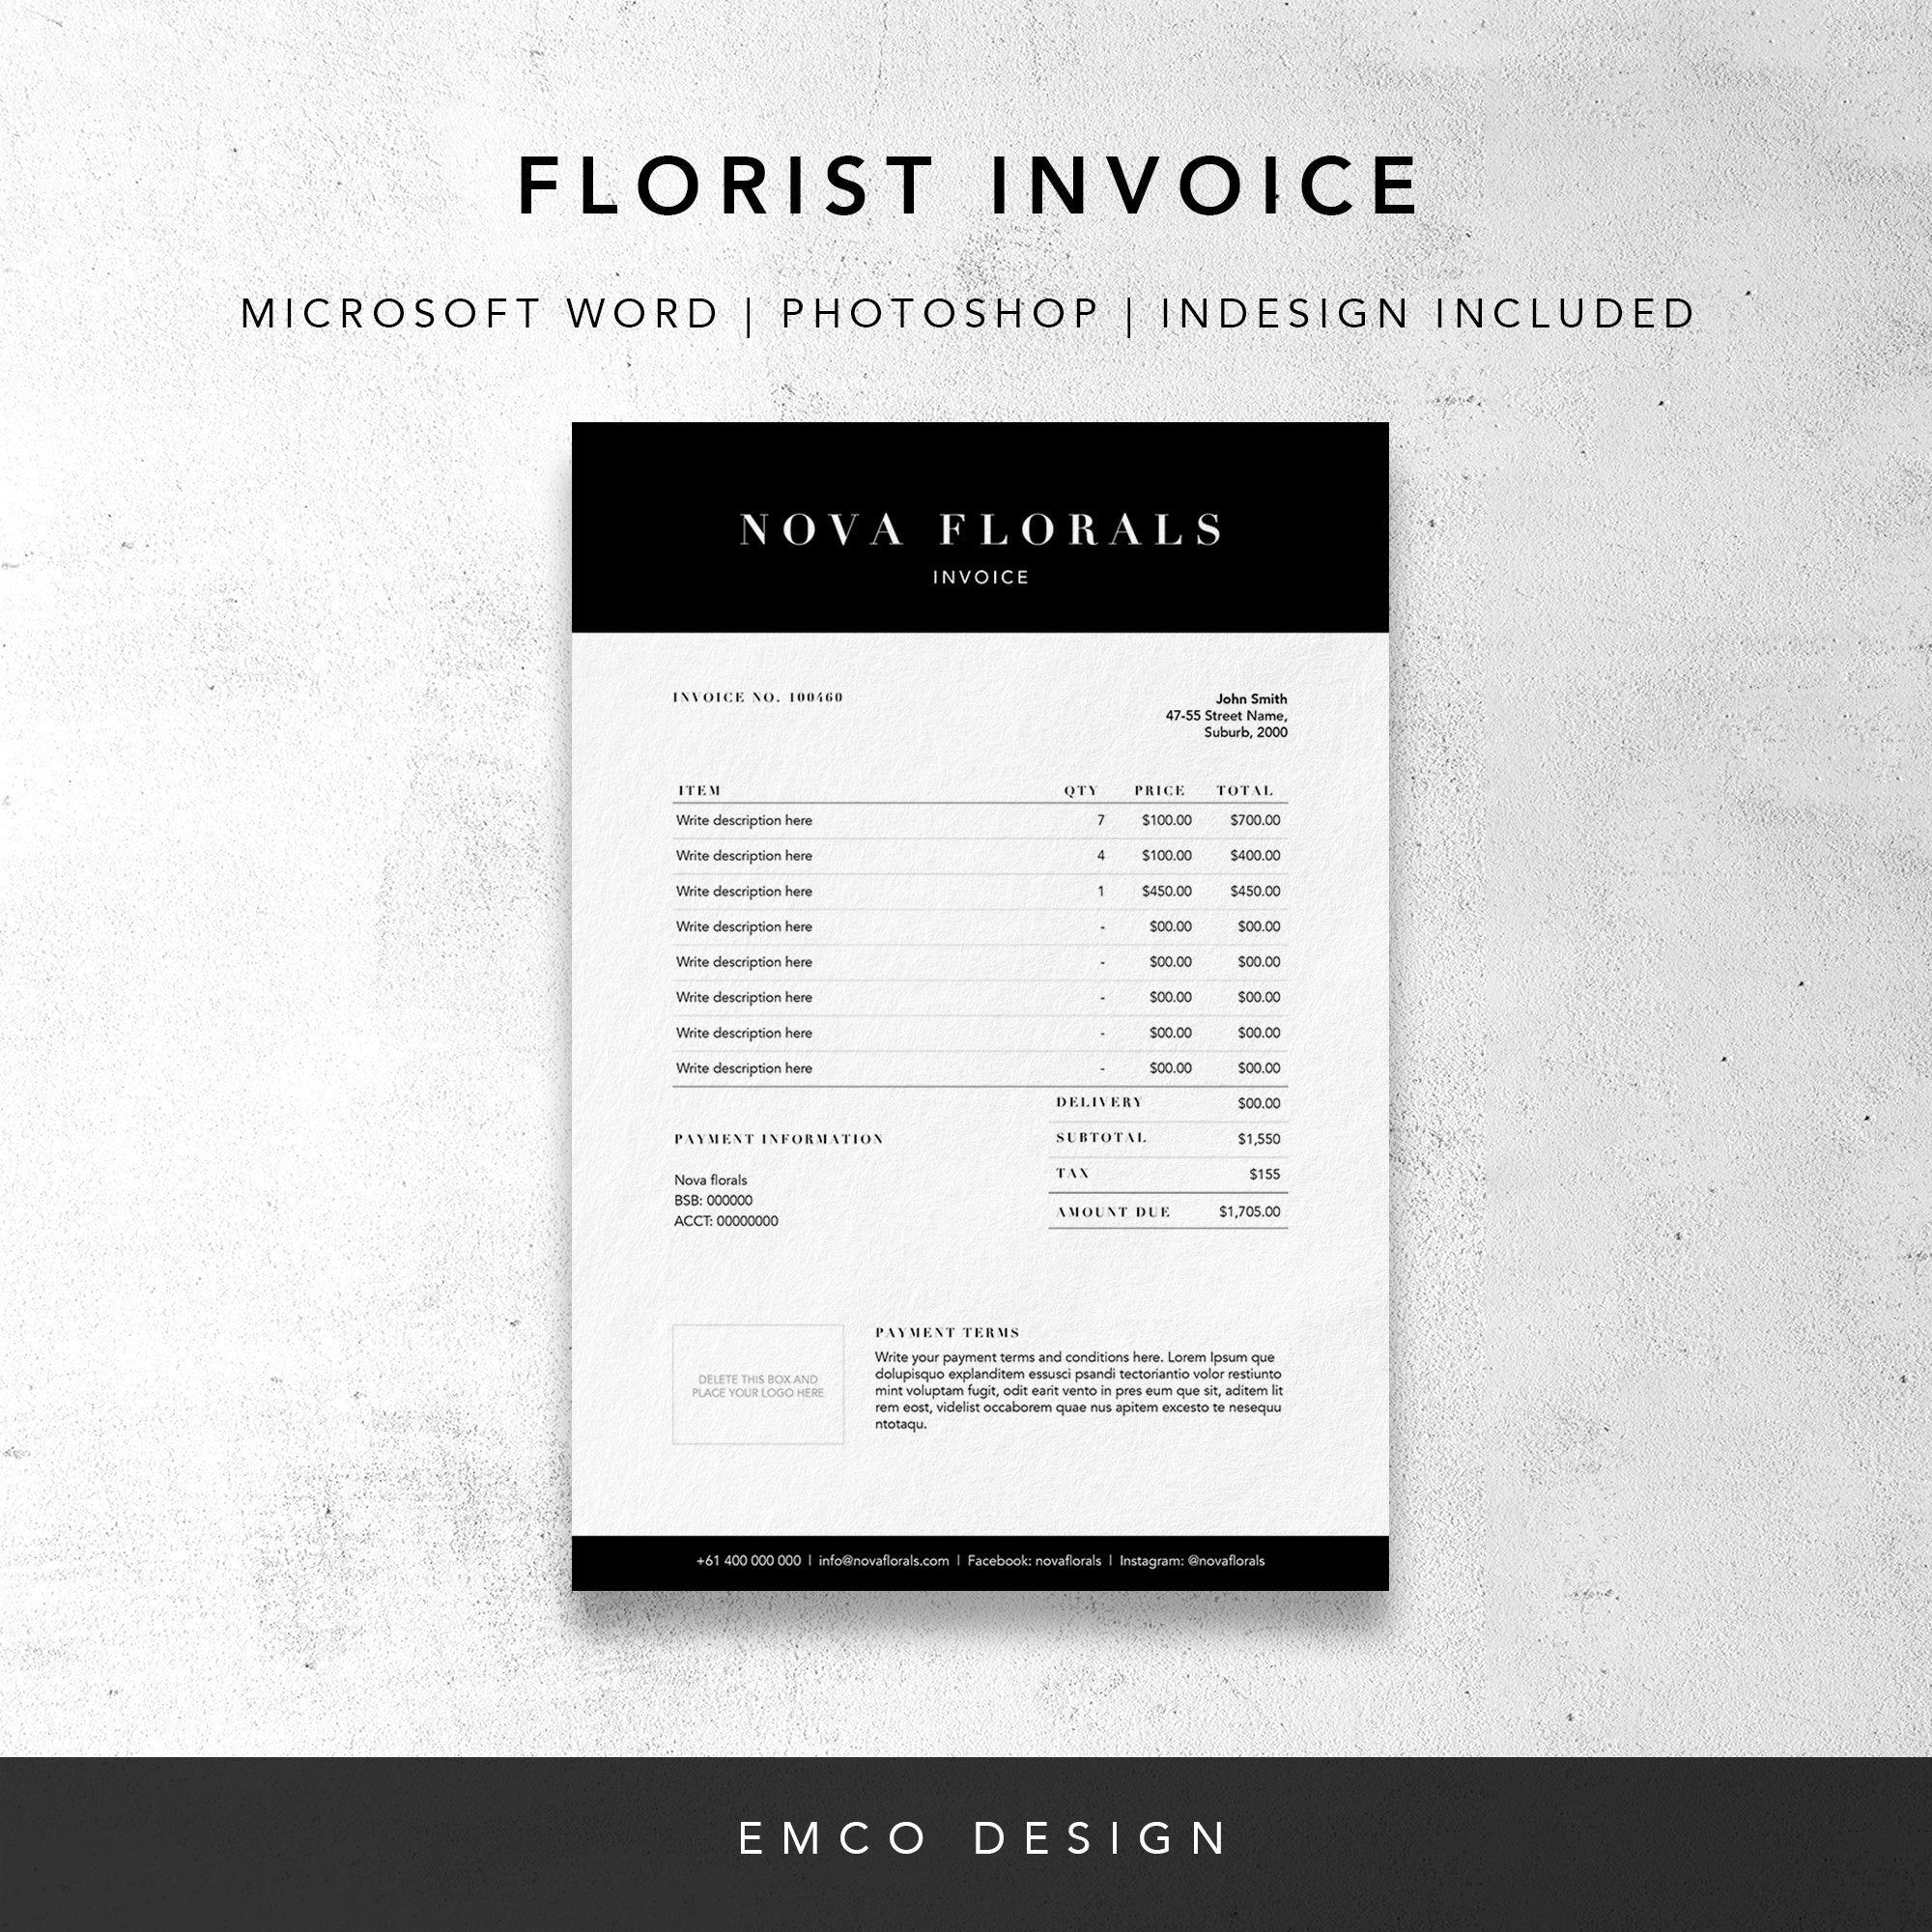 Florist Invoice Template Invoice Design Receipt Ms Word Etsy Invoice Design Invoice Template Printable Invoice